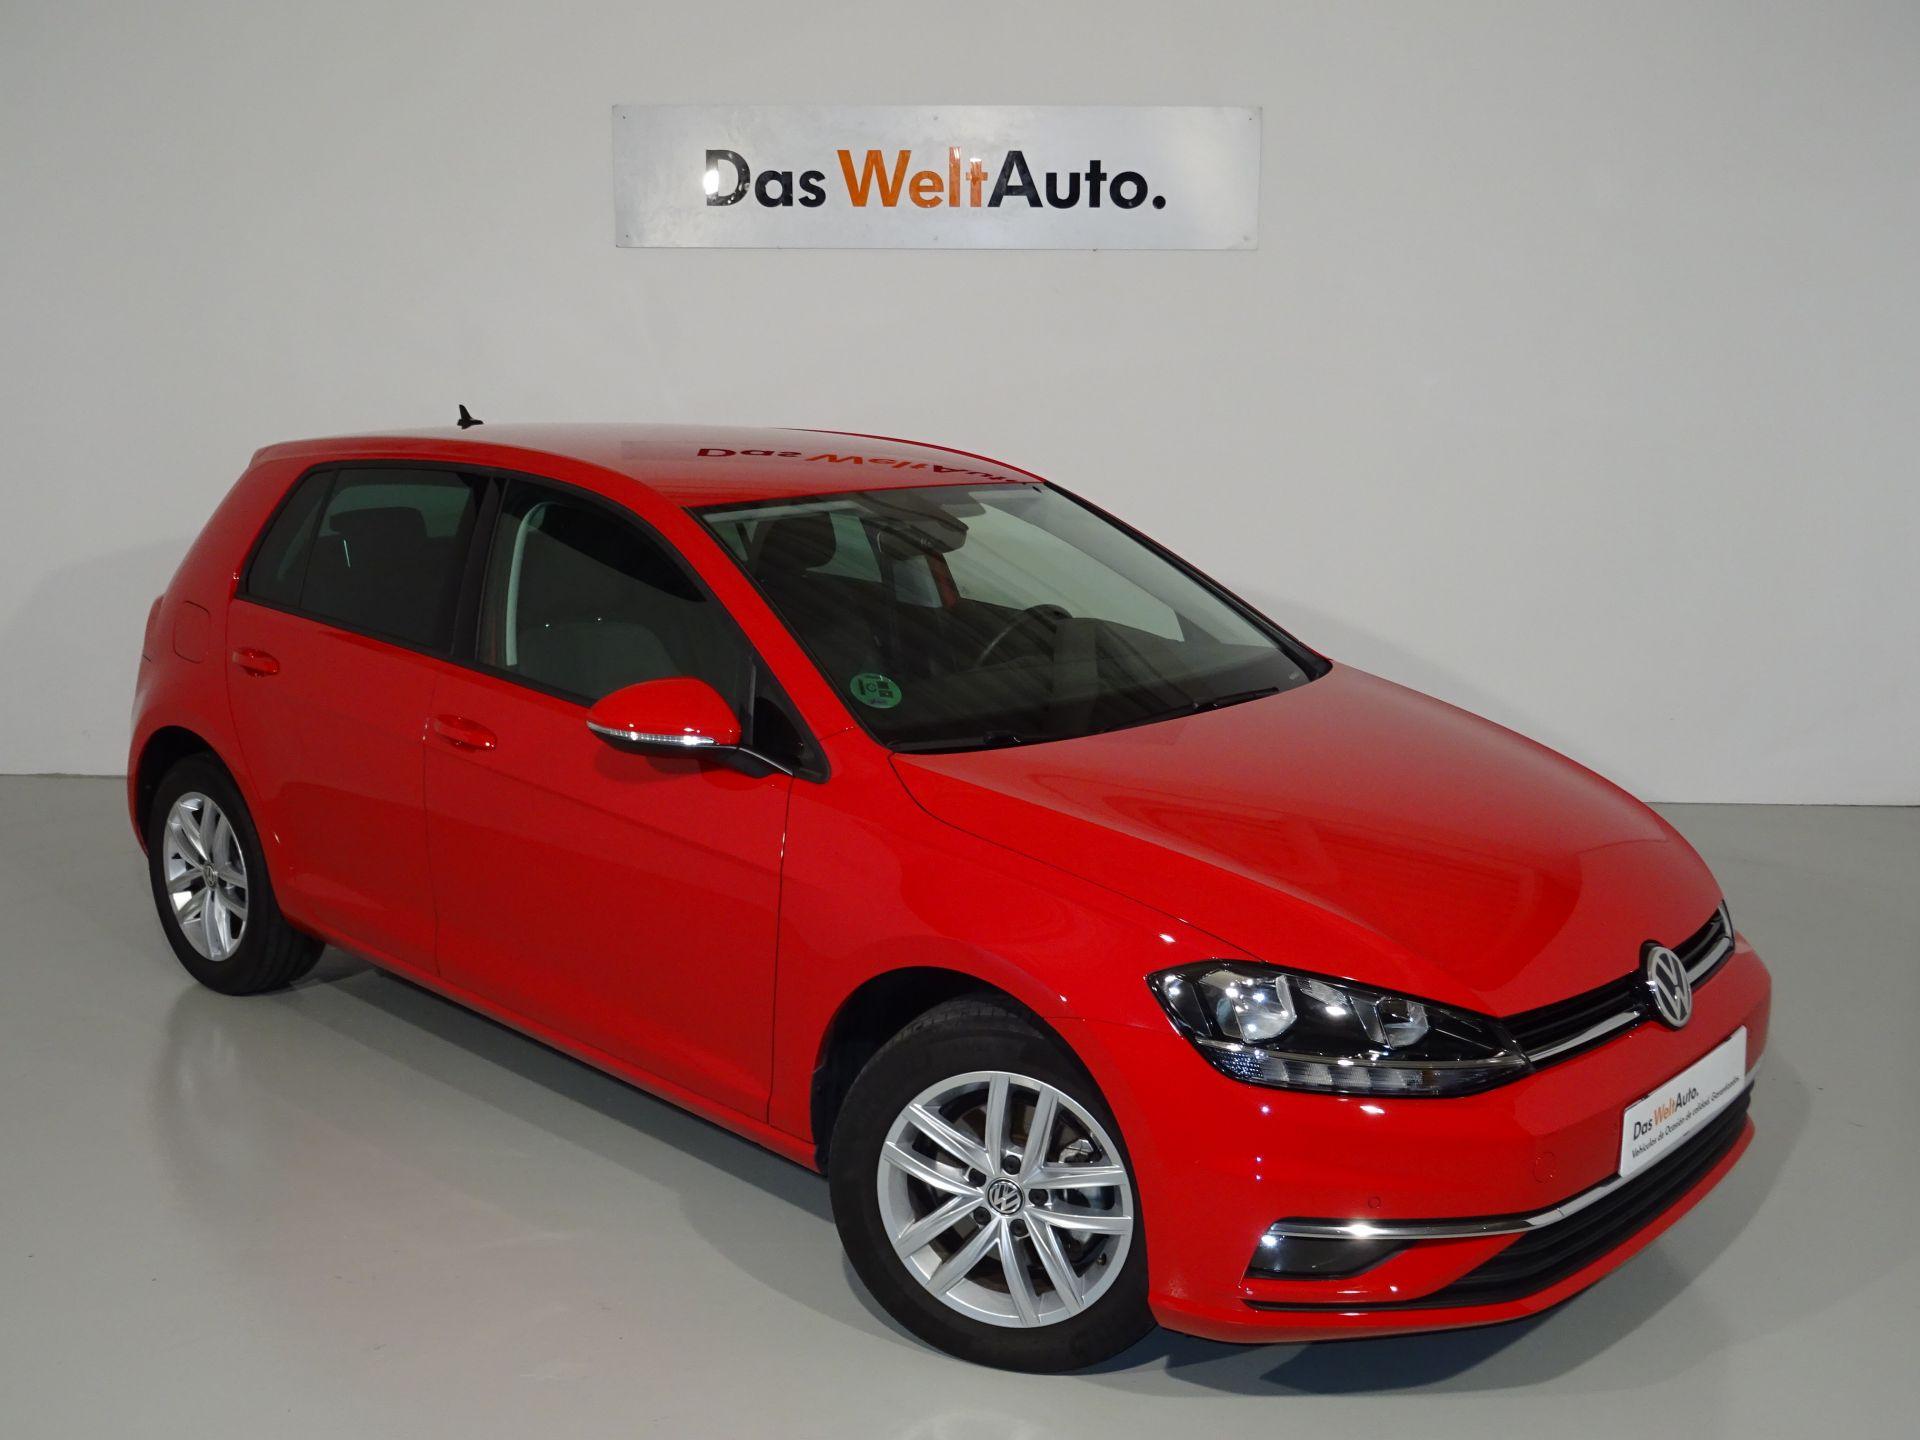 Volkswagen Golf Advance 1.6 TDI 85kW (115CV) DSG